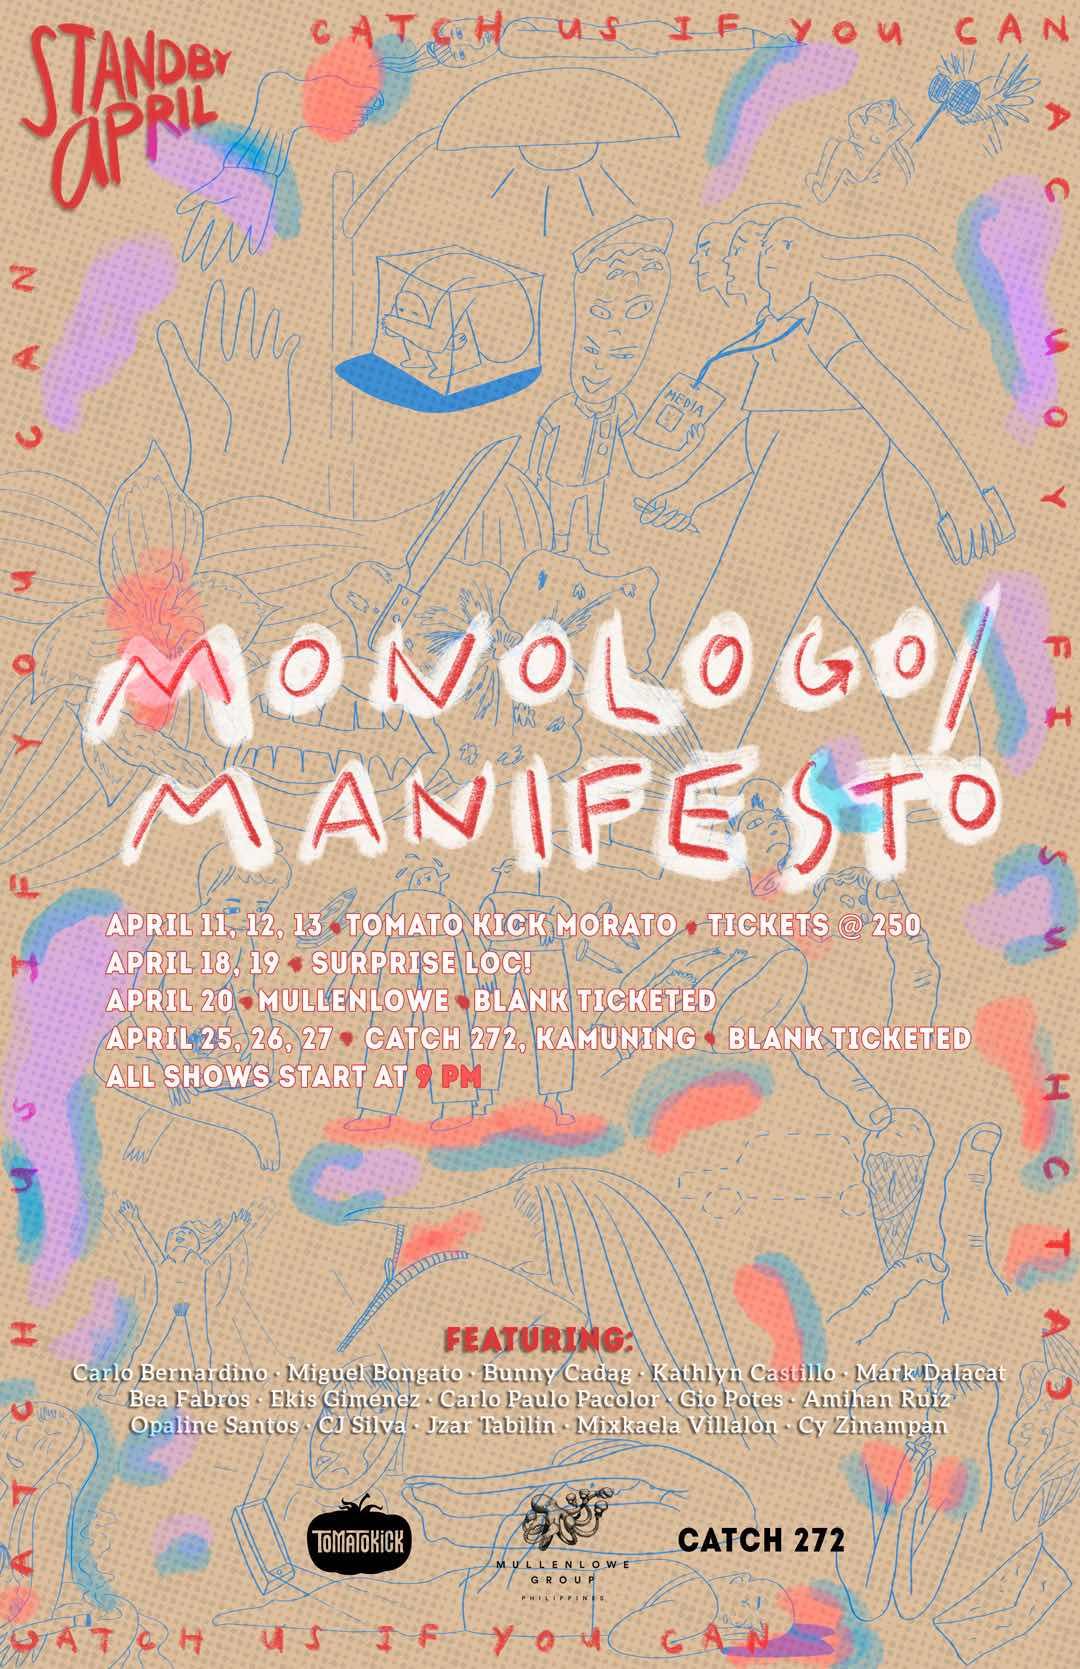 standby-april-monologo-manifesto